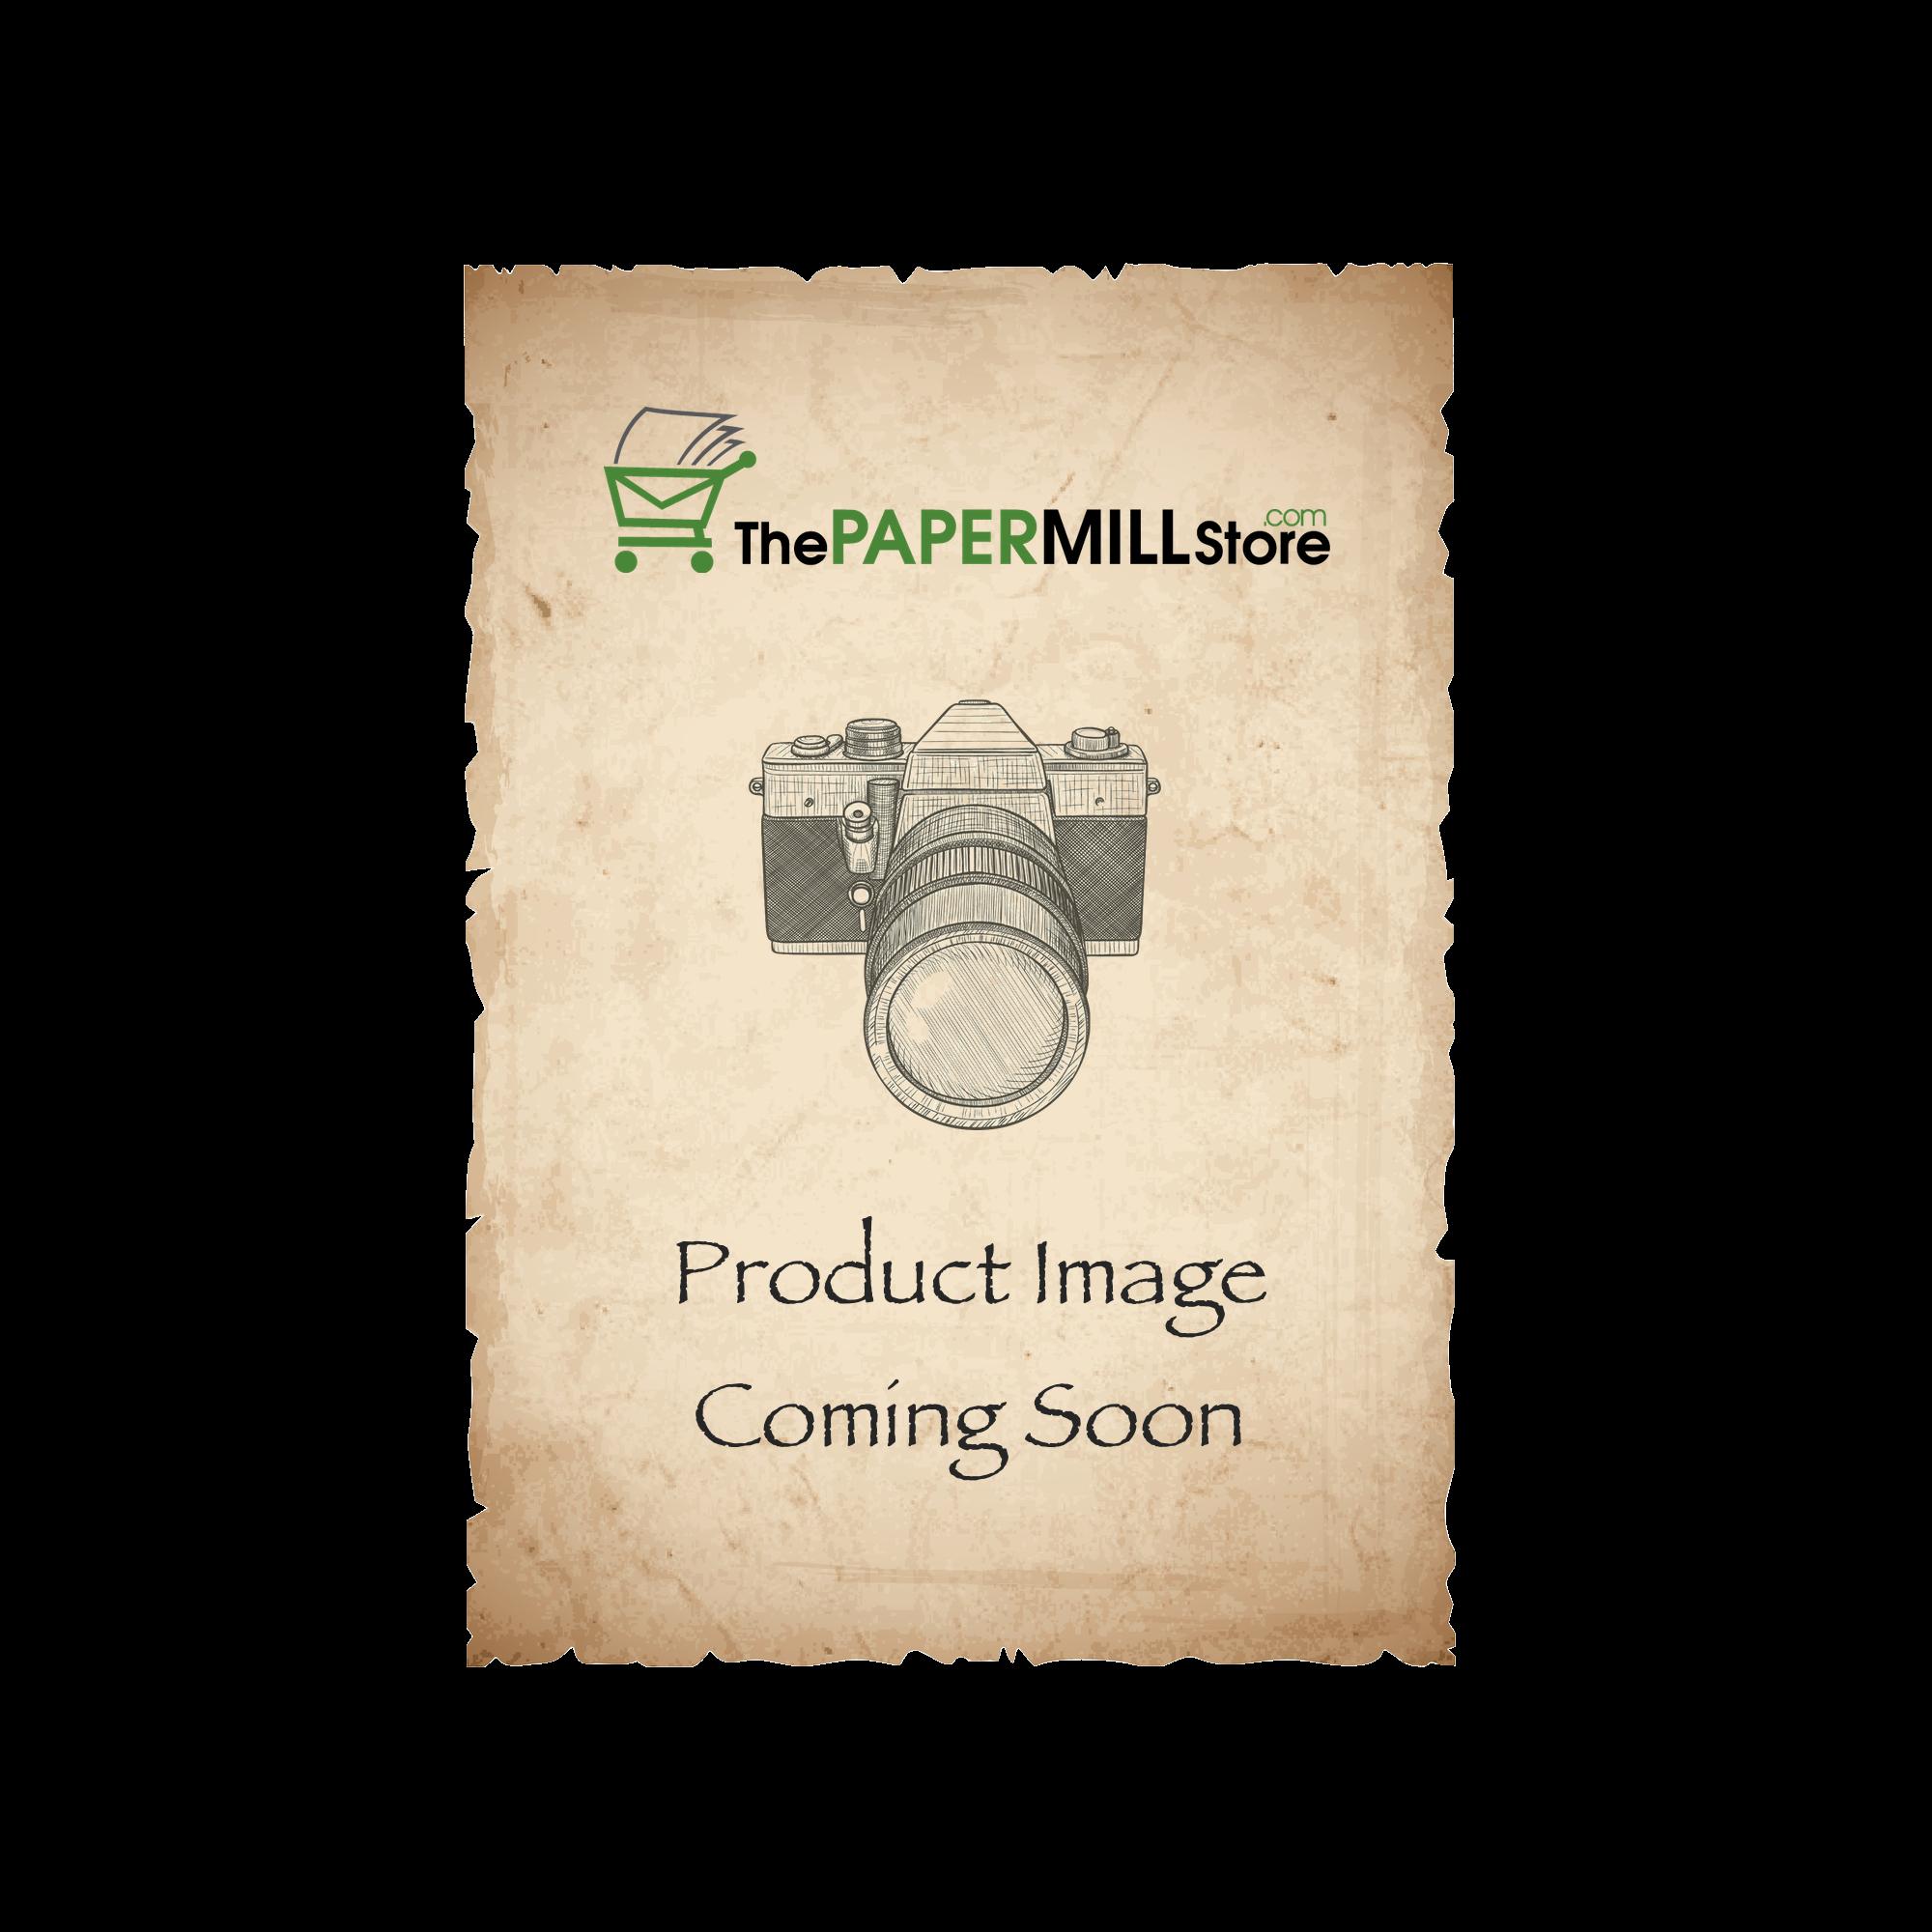 Splendorlux Black Paper - 27 1/2 x 39 3/8 in 11.5 pt Cover Laser C/1S 125 per Package